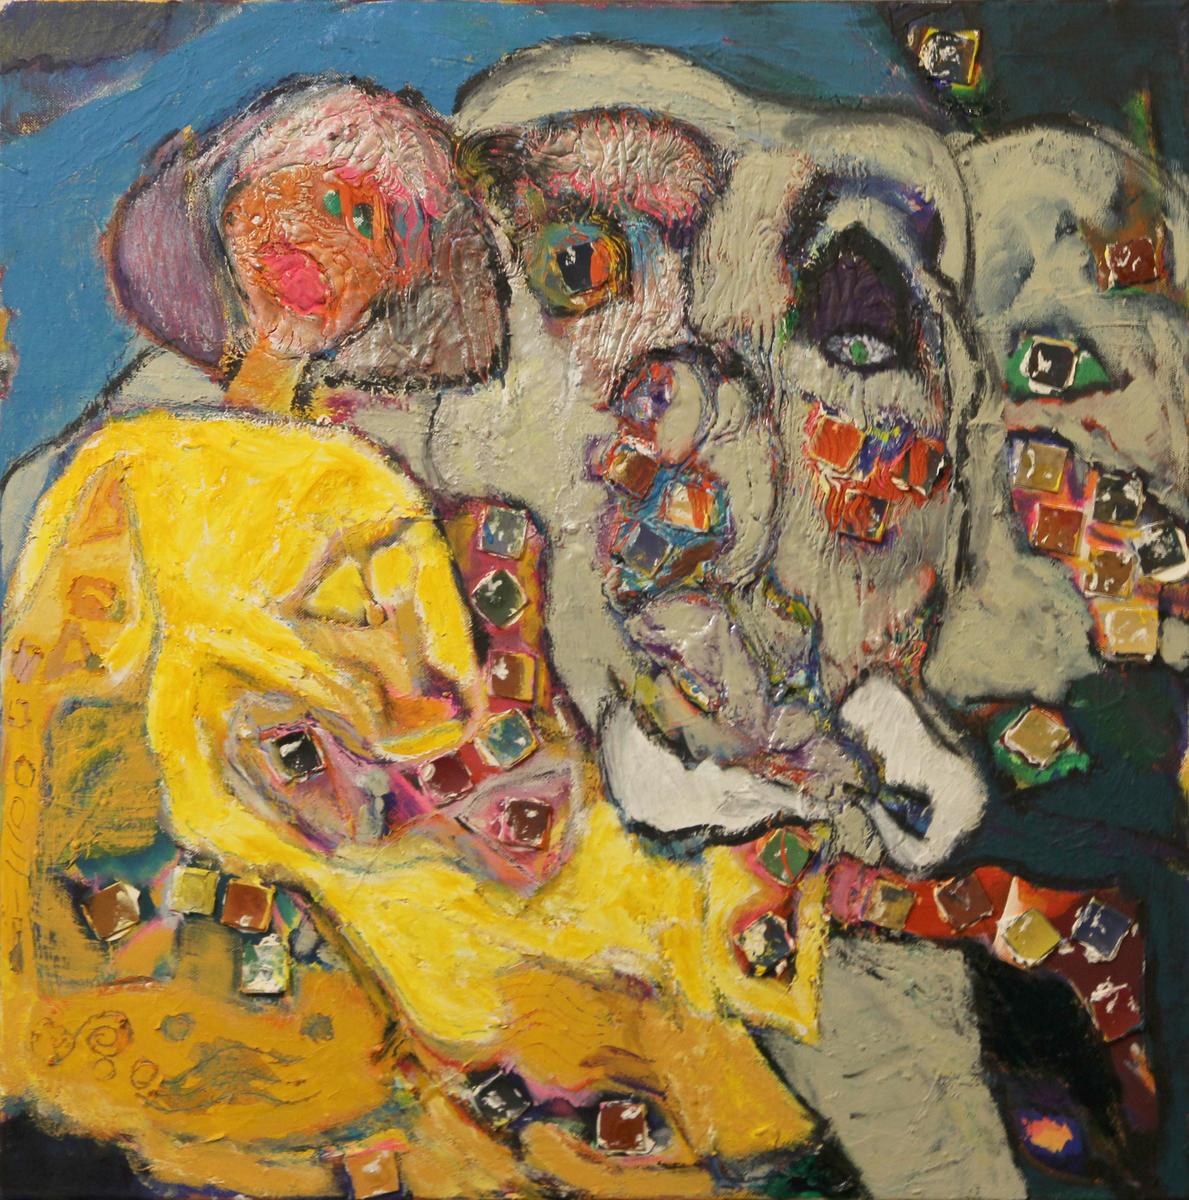 Malerei | Paintings 2015 - present